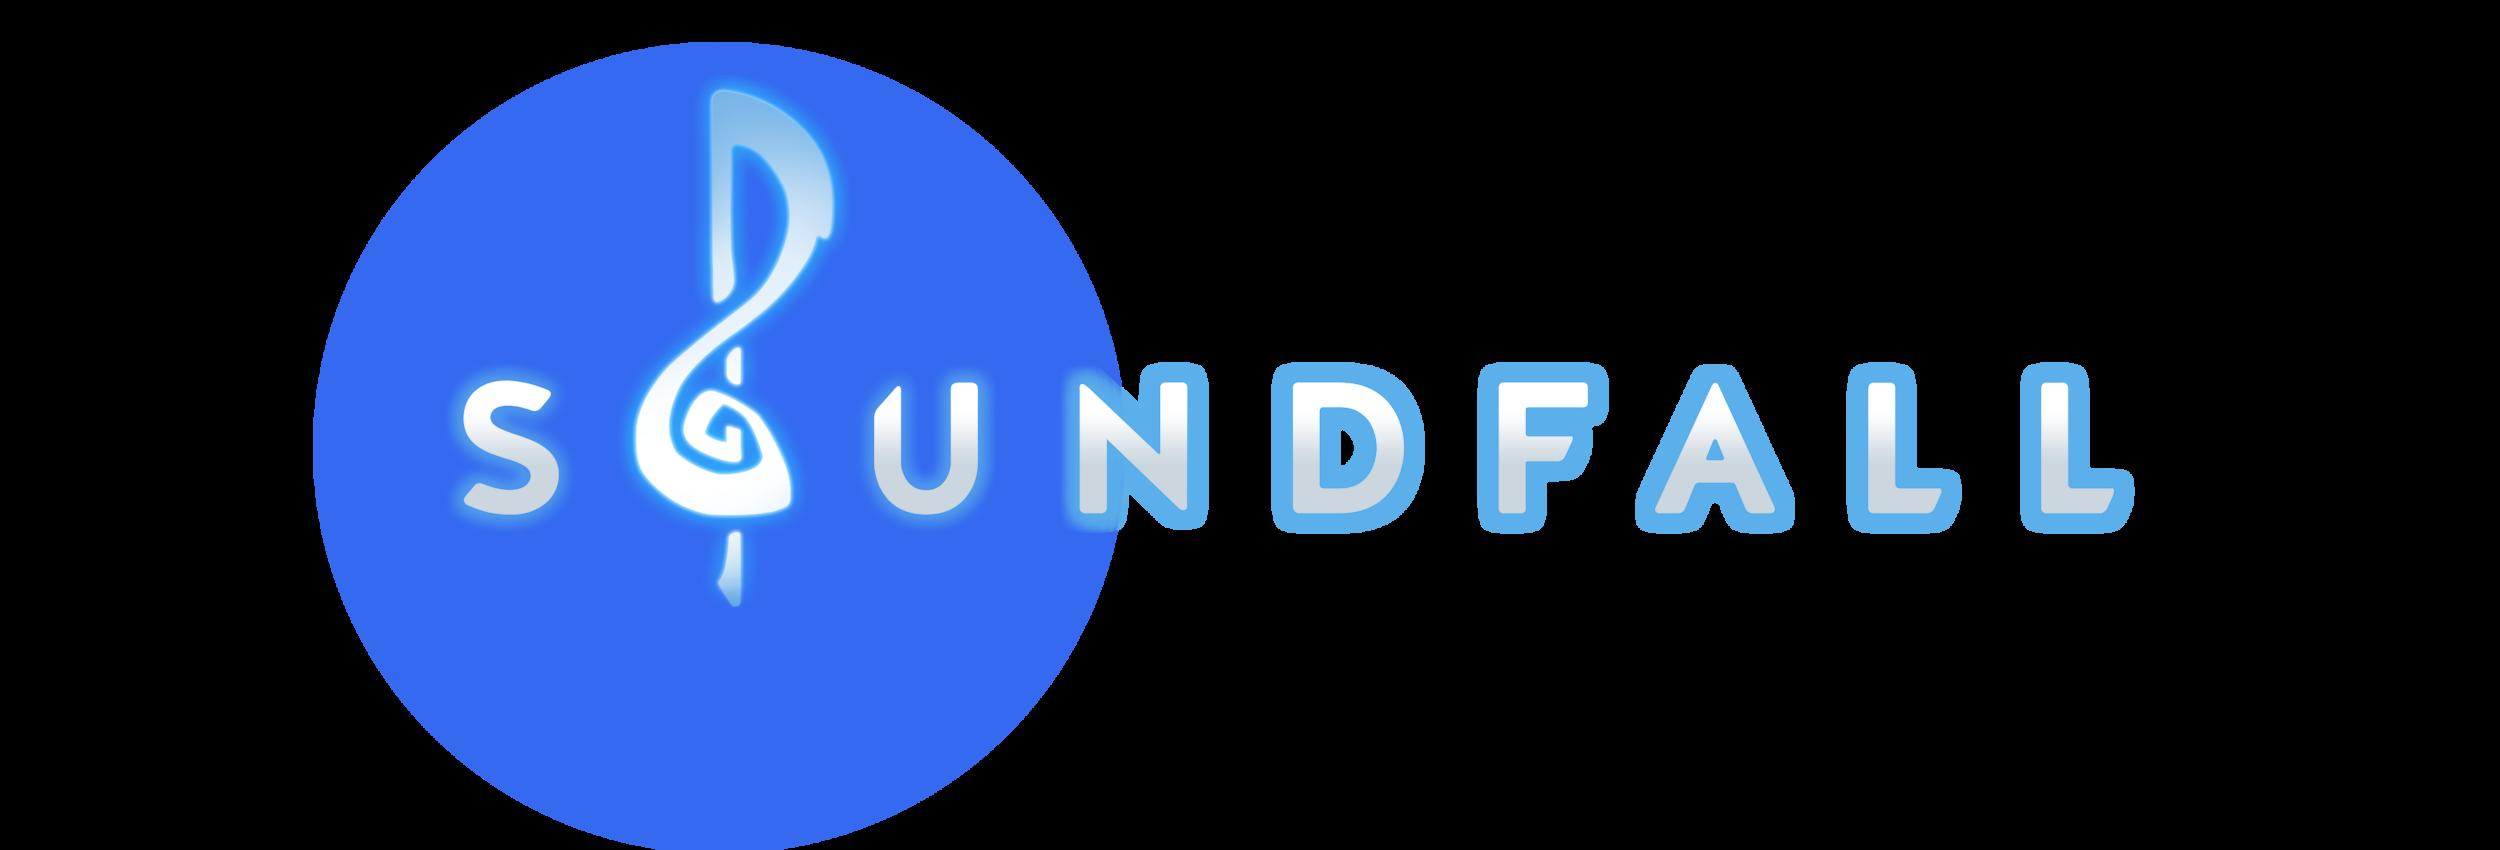 Sounfall-logo-raster-sm-02.png